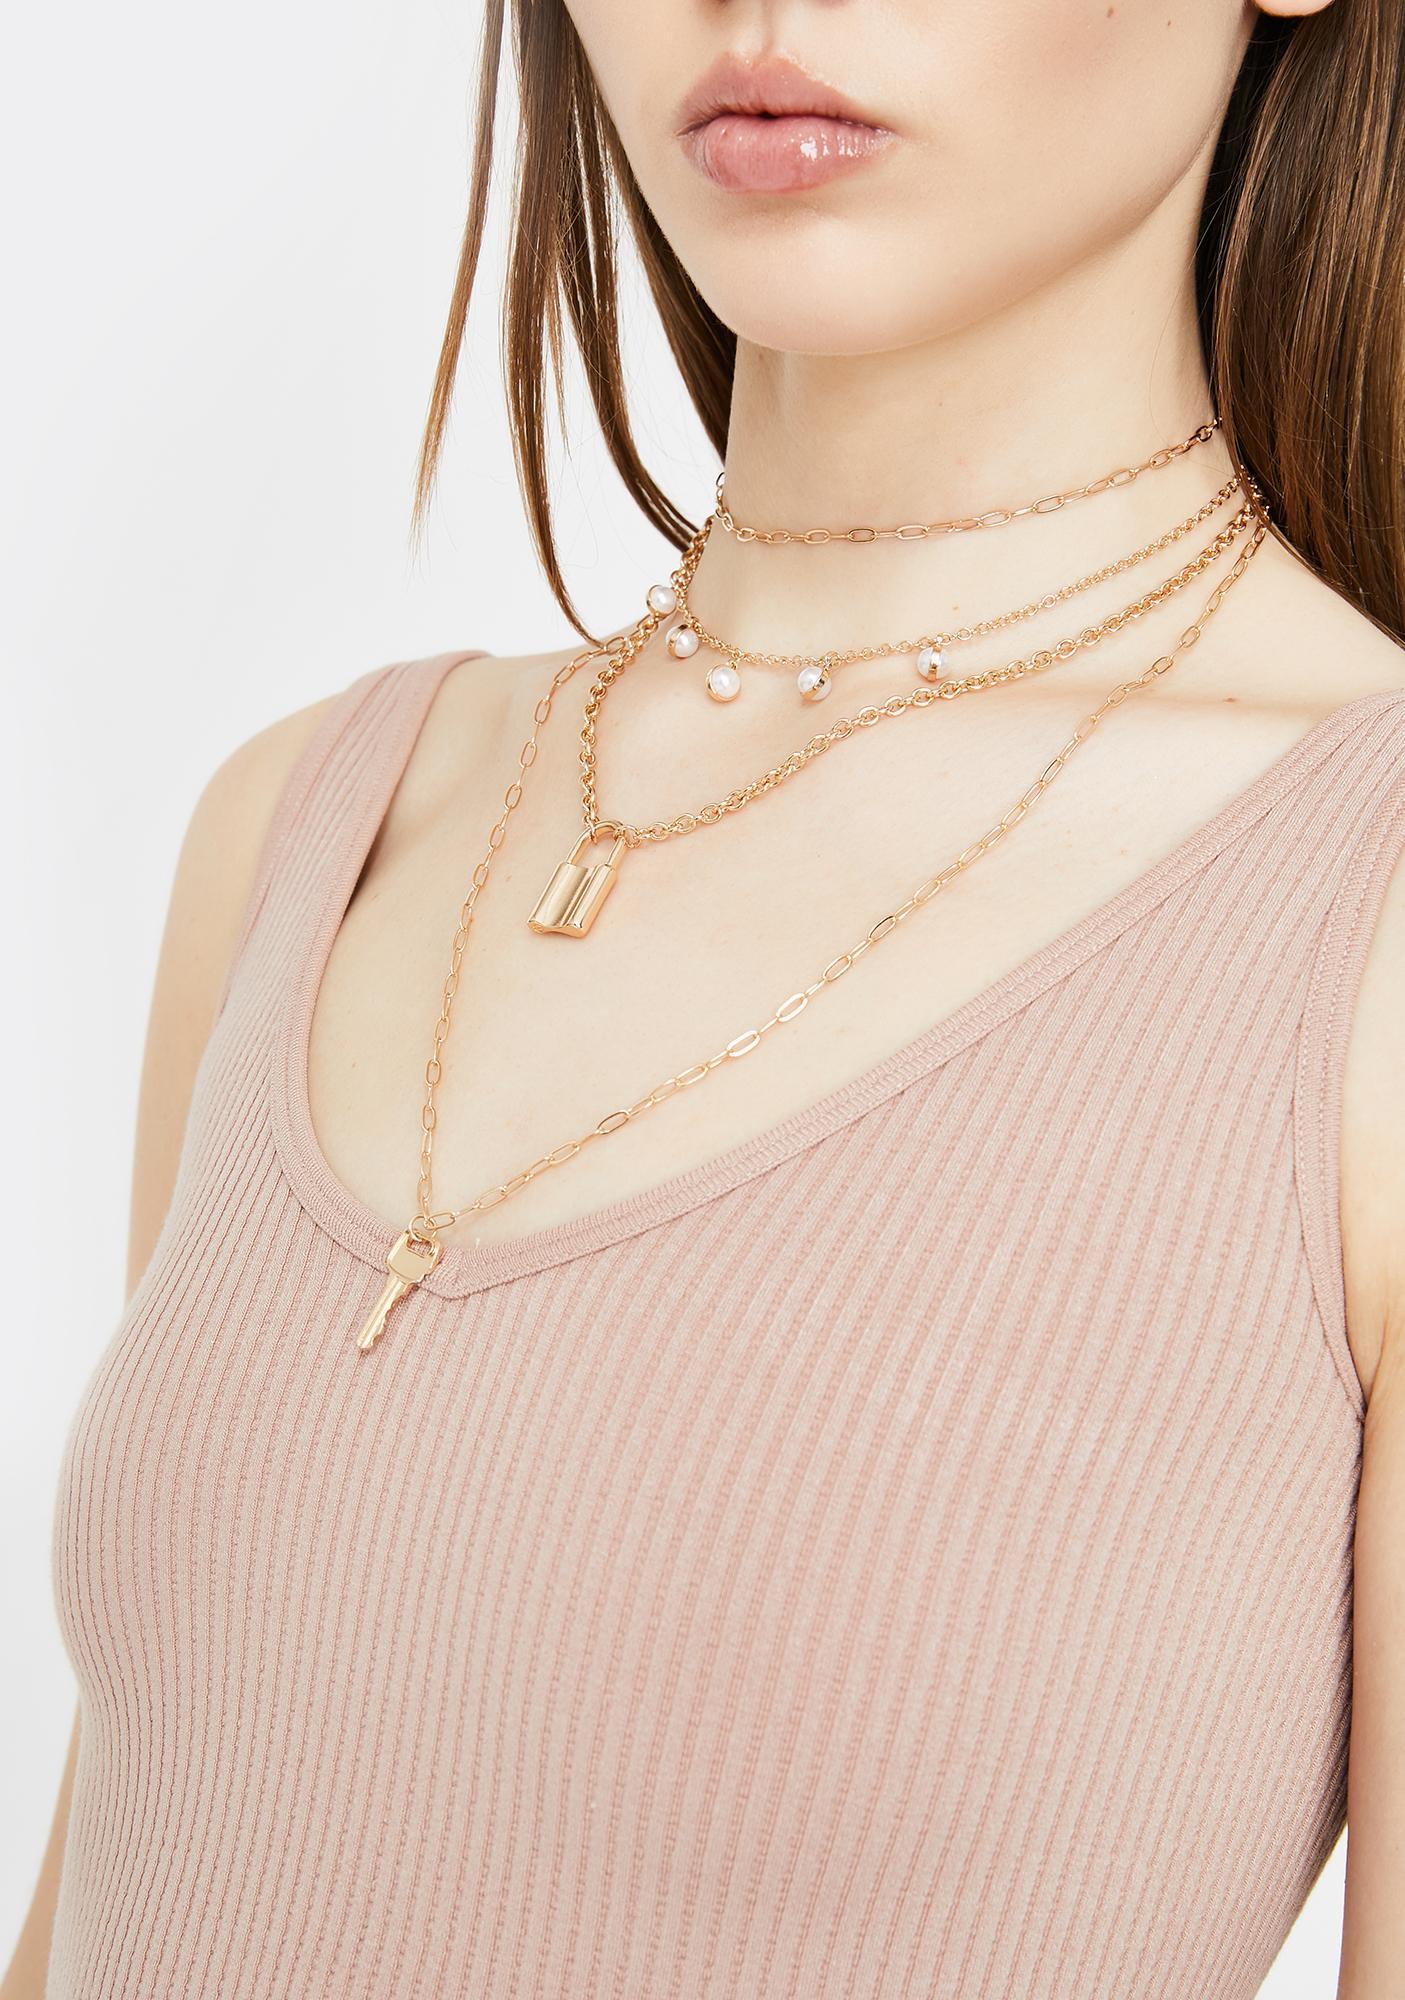 Under Lock N' Key Charm Necklace